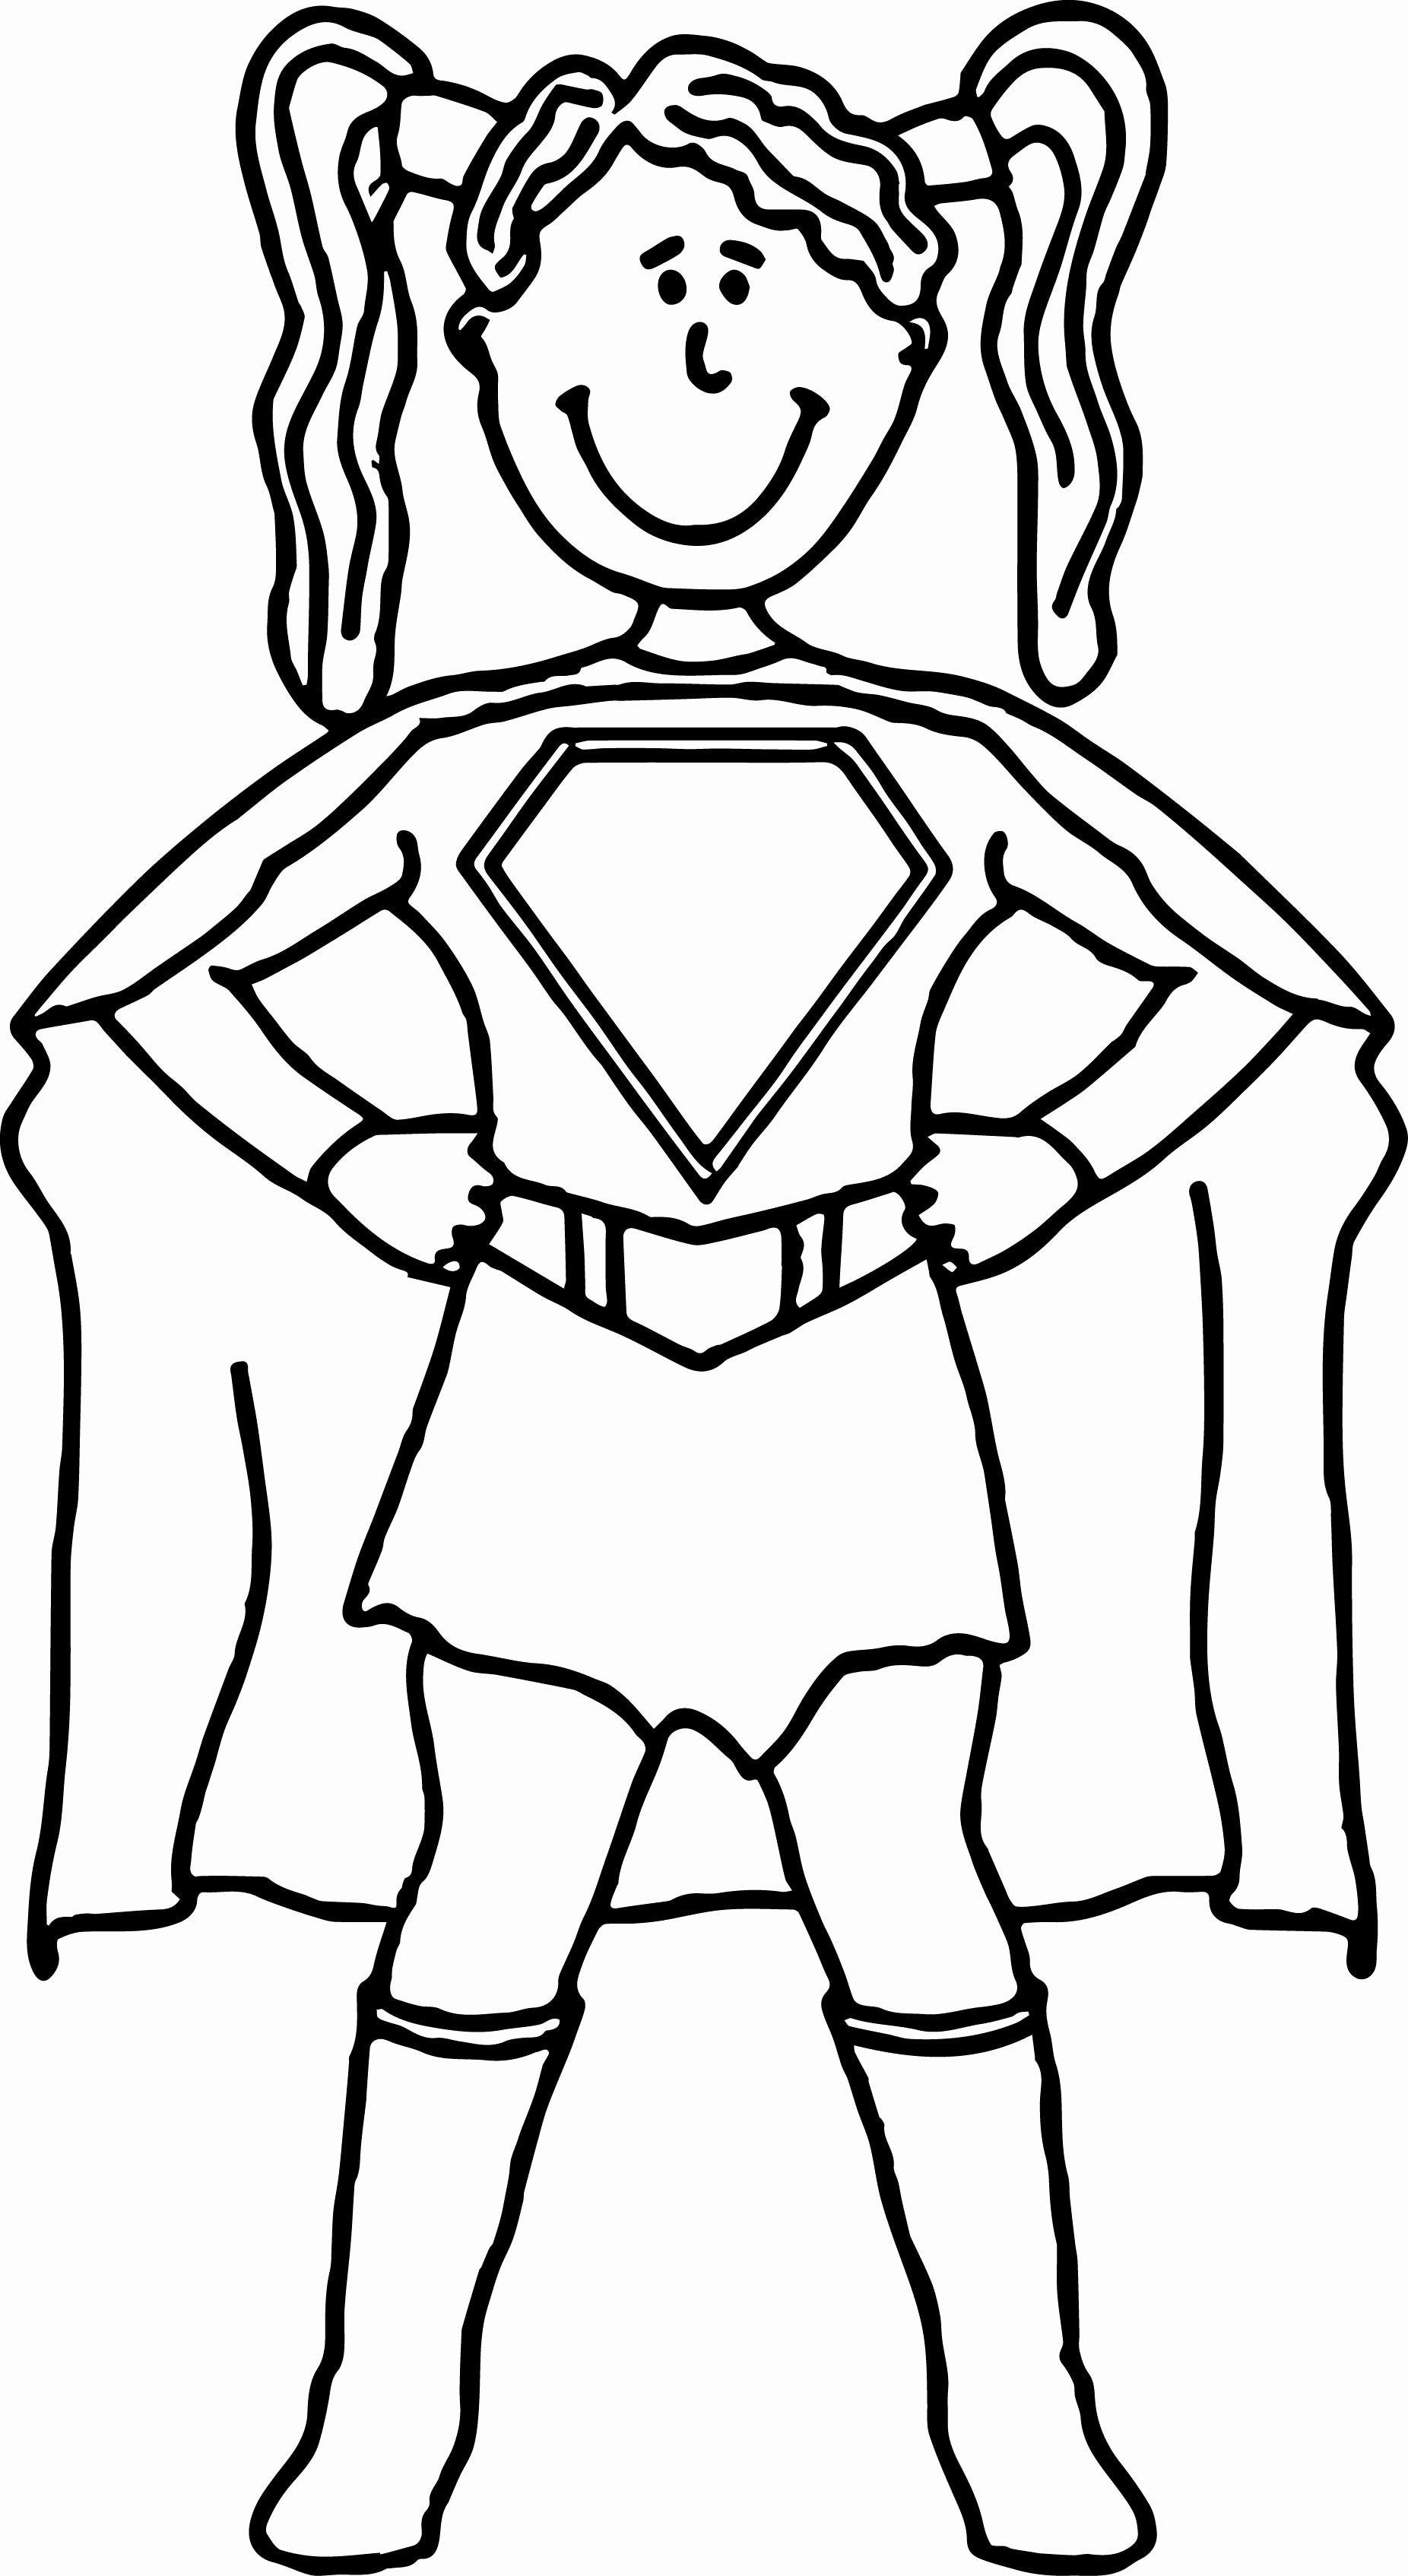 Superhero Coloring Pages for Preschoolers New Superhero ...